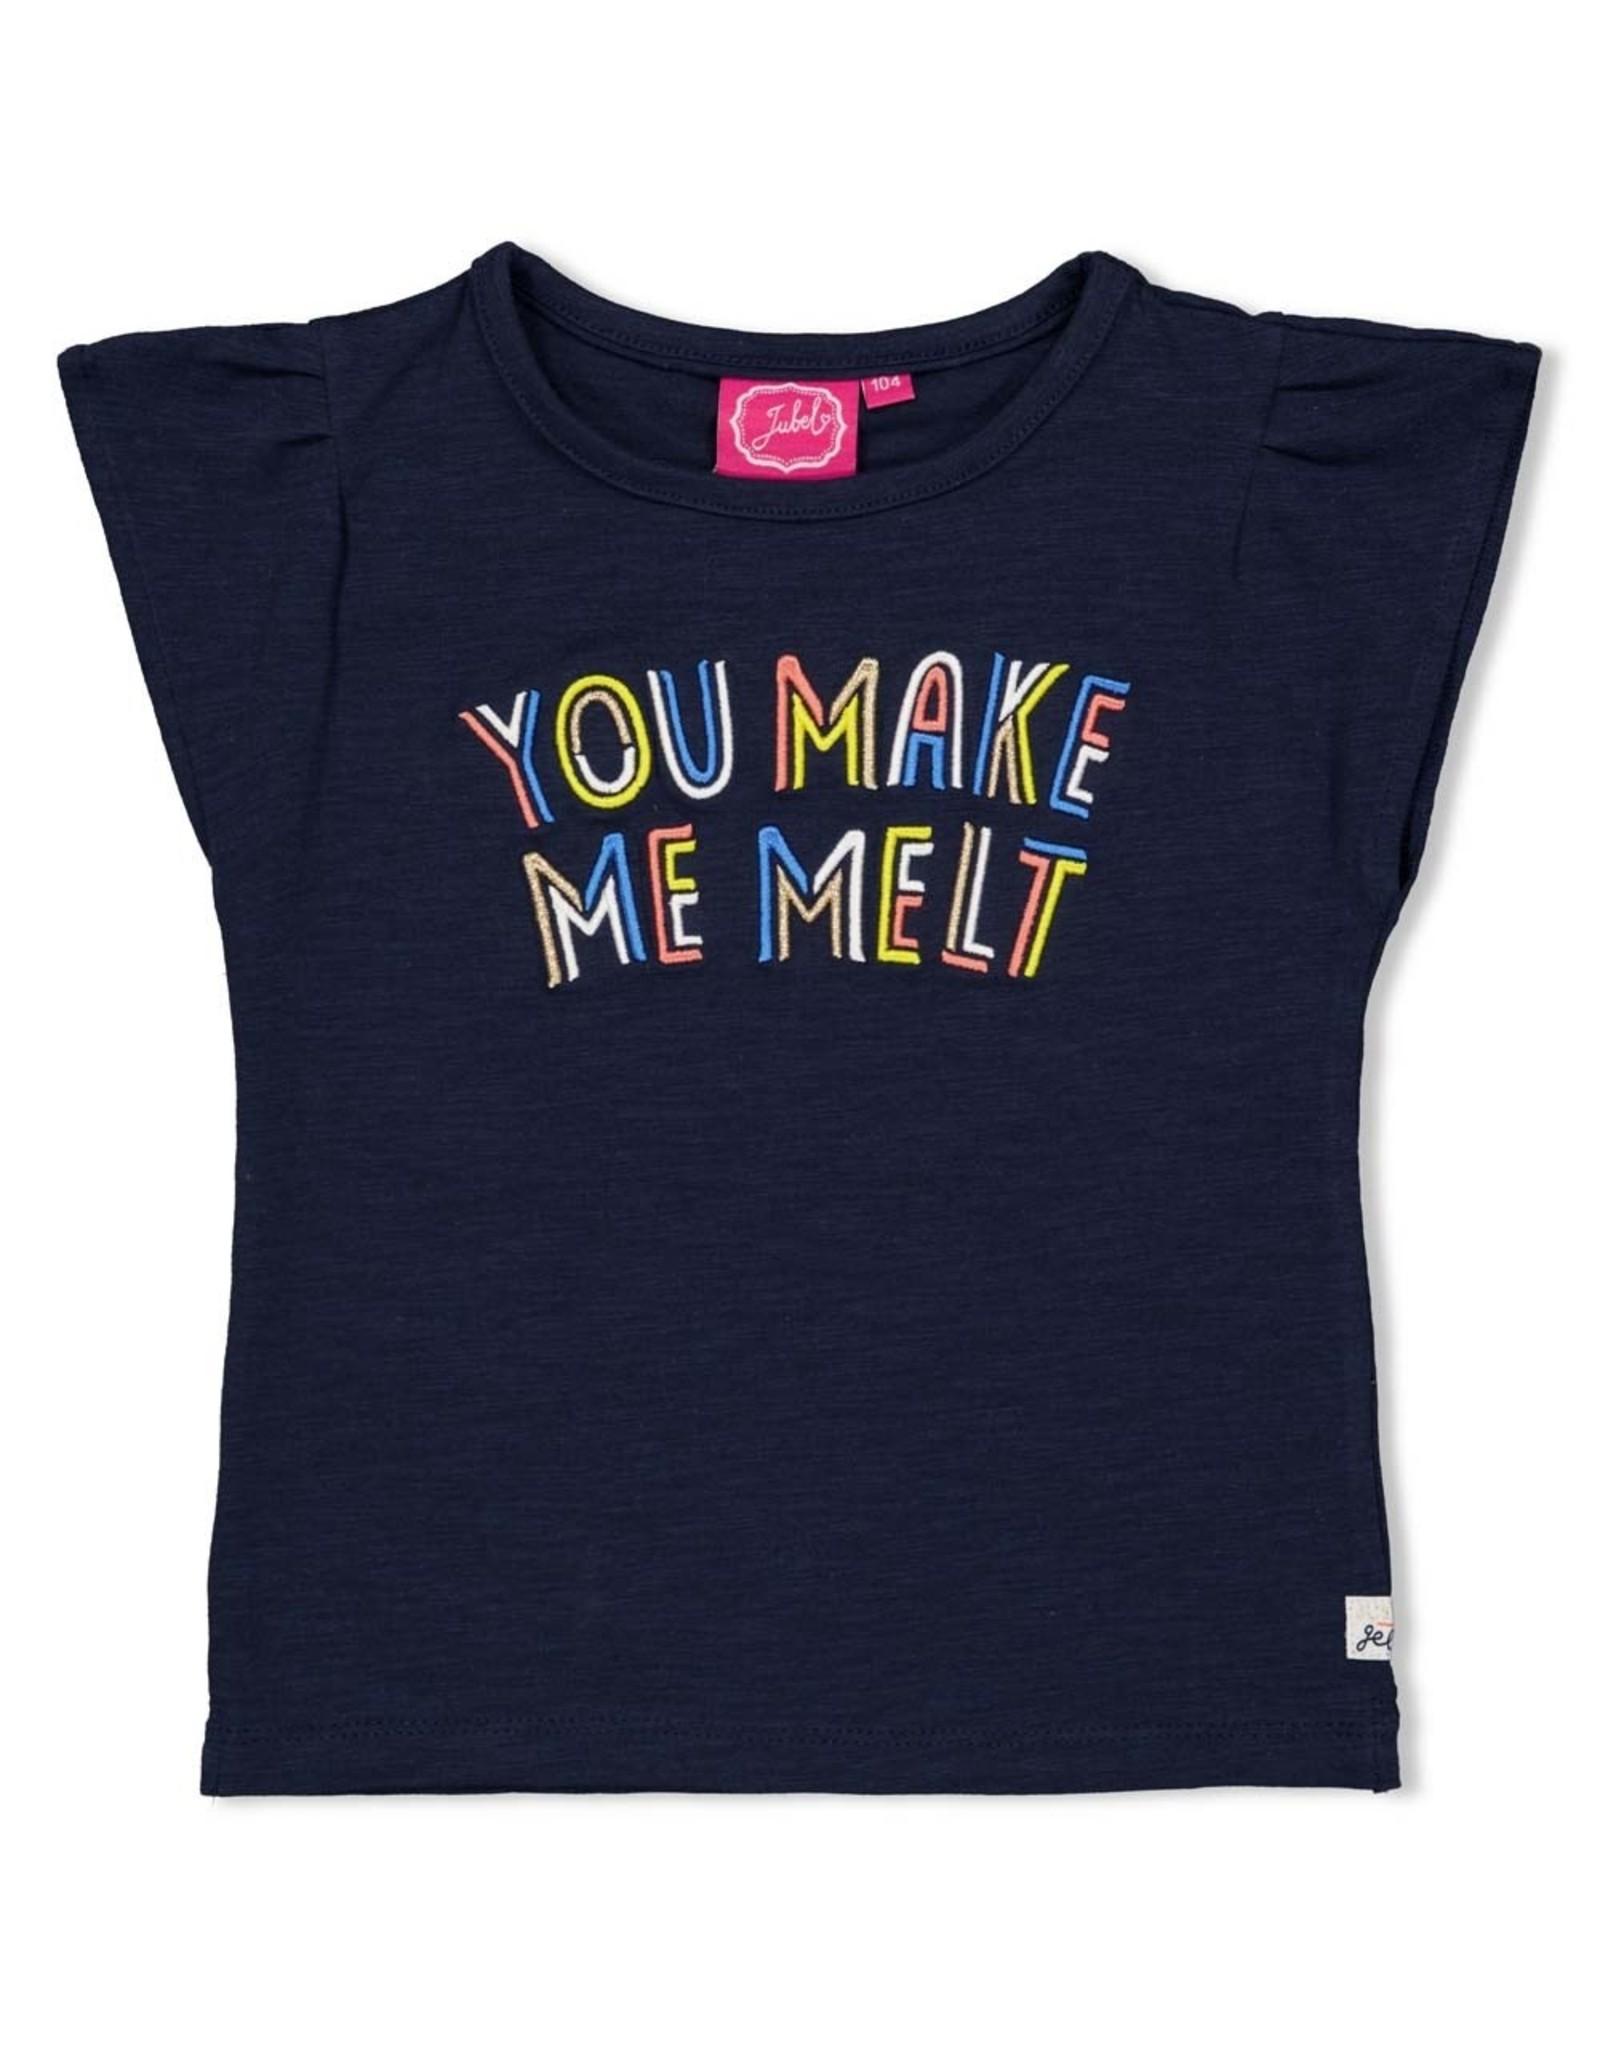 Jubel T-shirt Melt - Sweet Gelato Marine